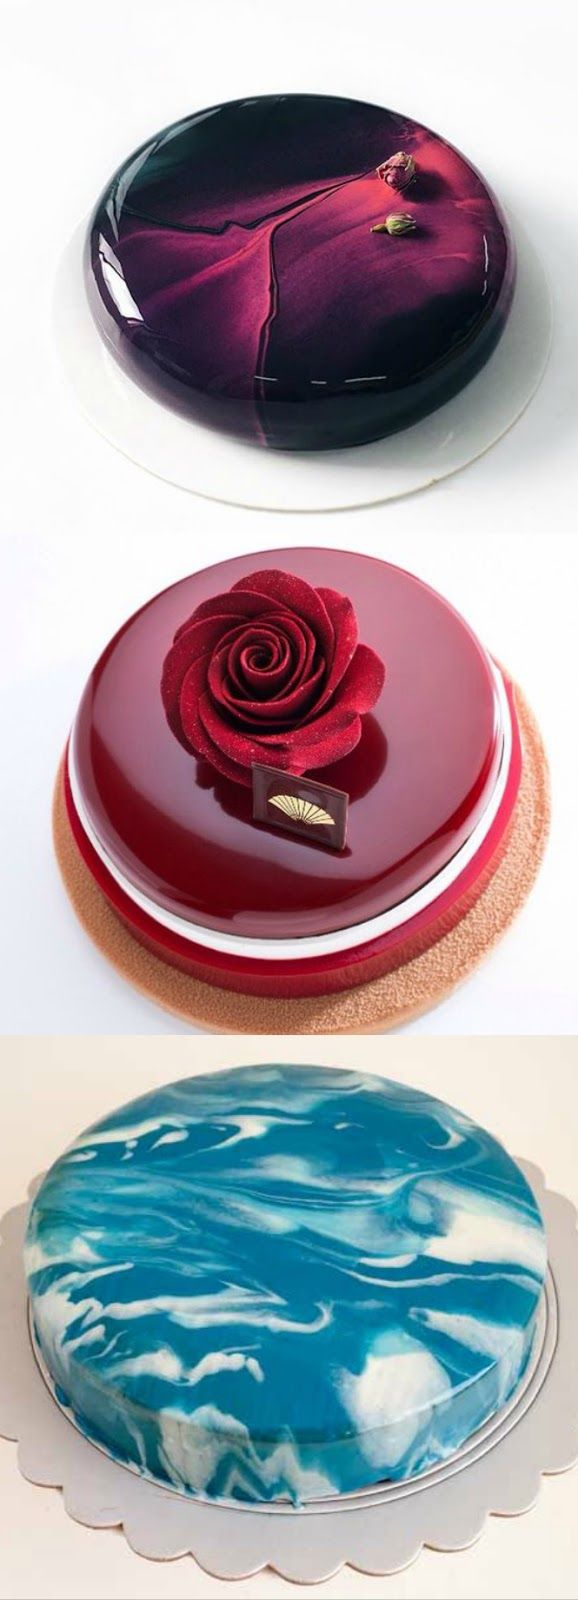 mirror glazed cake perfection tort k pinterest p tisserie gateau miroir et dessert. Black Bedroom Furniture Sets. Home Design Ideas